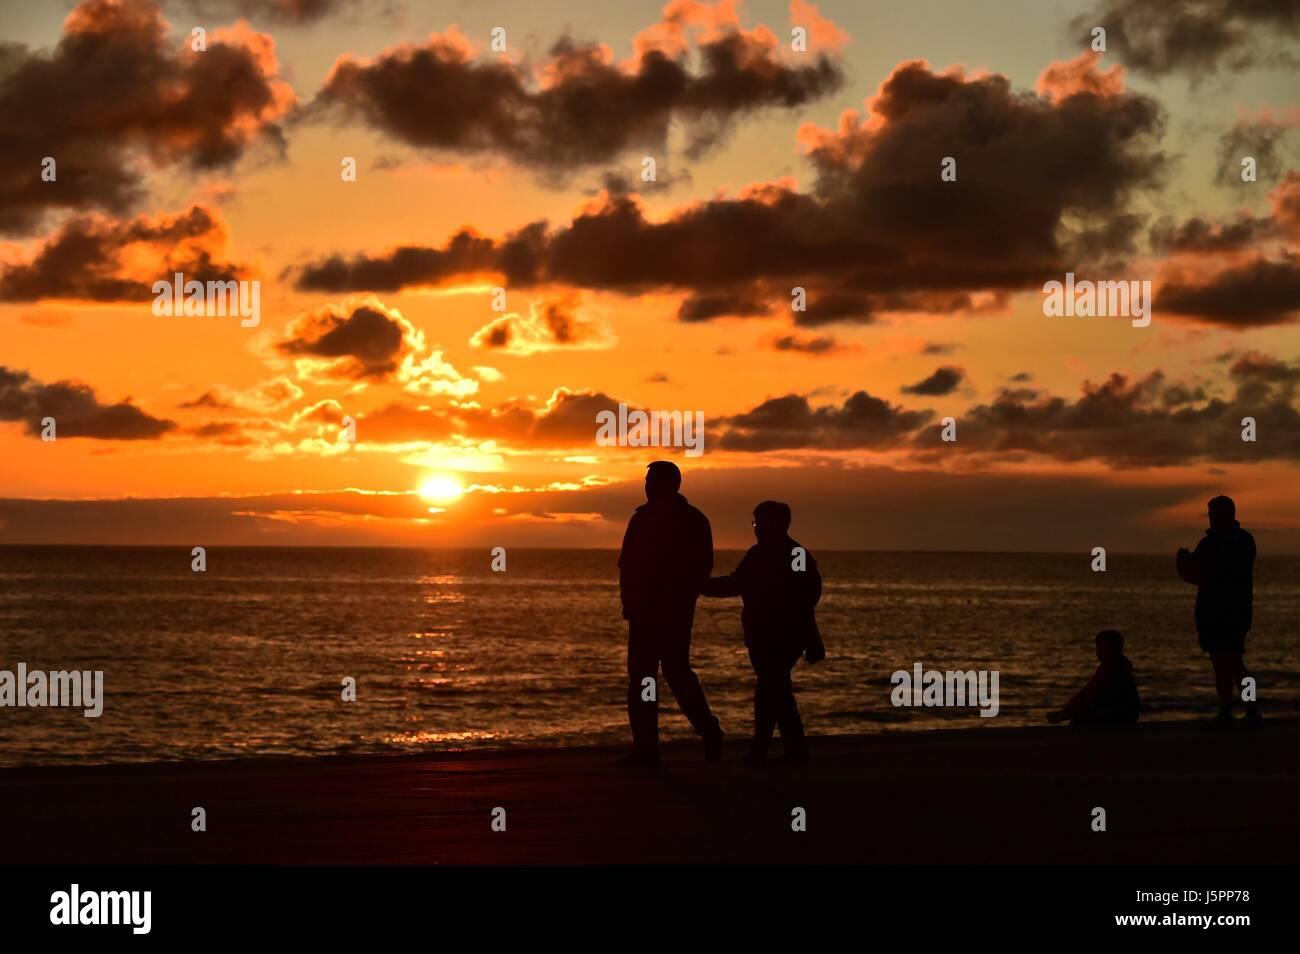 Aberystwyth Wales Uk, Thursday 18 May 2017  UK Weather: Golden sunset over Cardigan Bay in Aberystwyth on the Cardigan - Stock Image